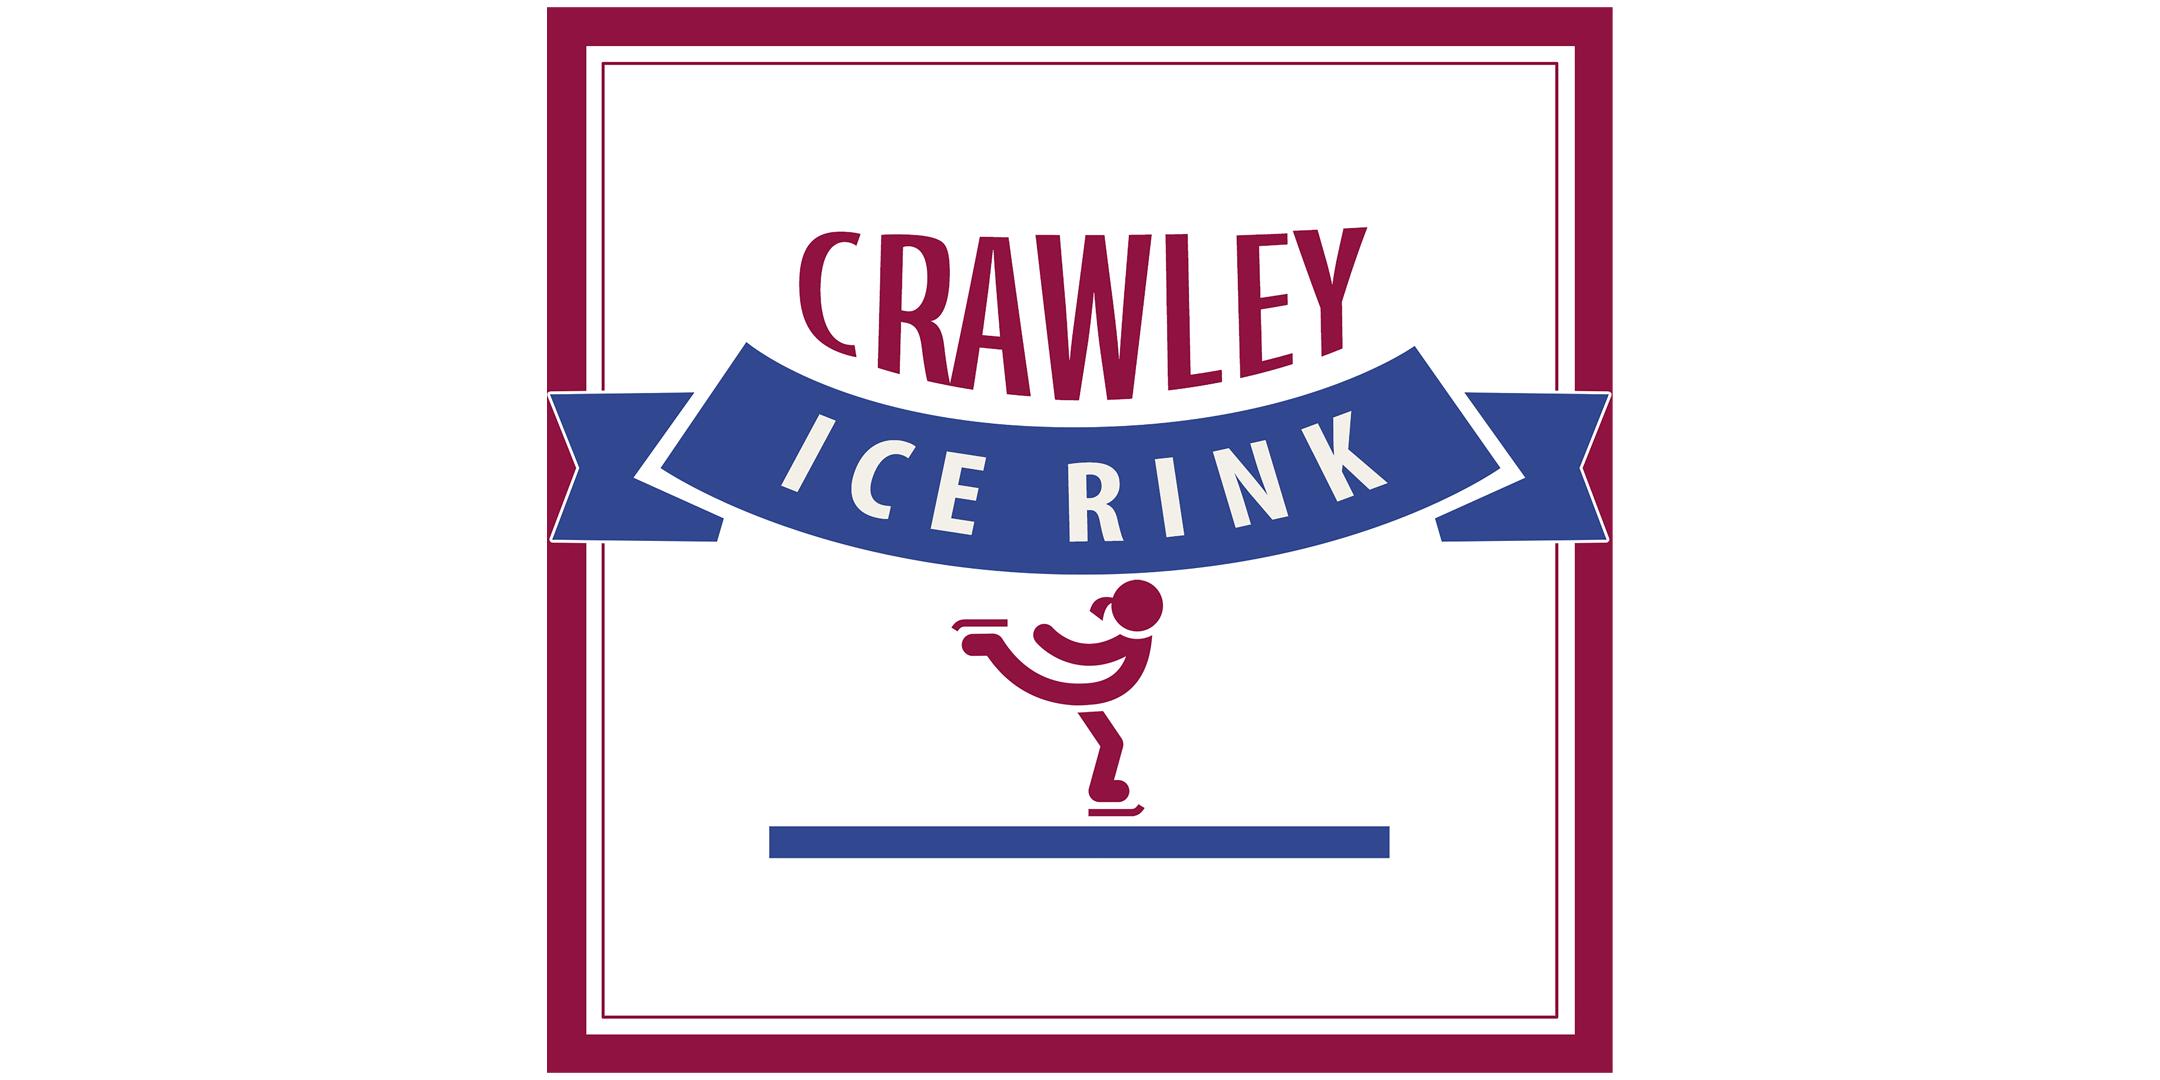 Crawley Ice Rink - 26th November (Peak)